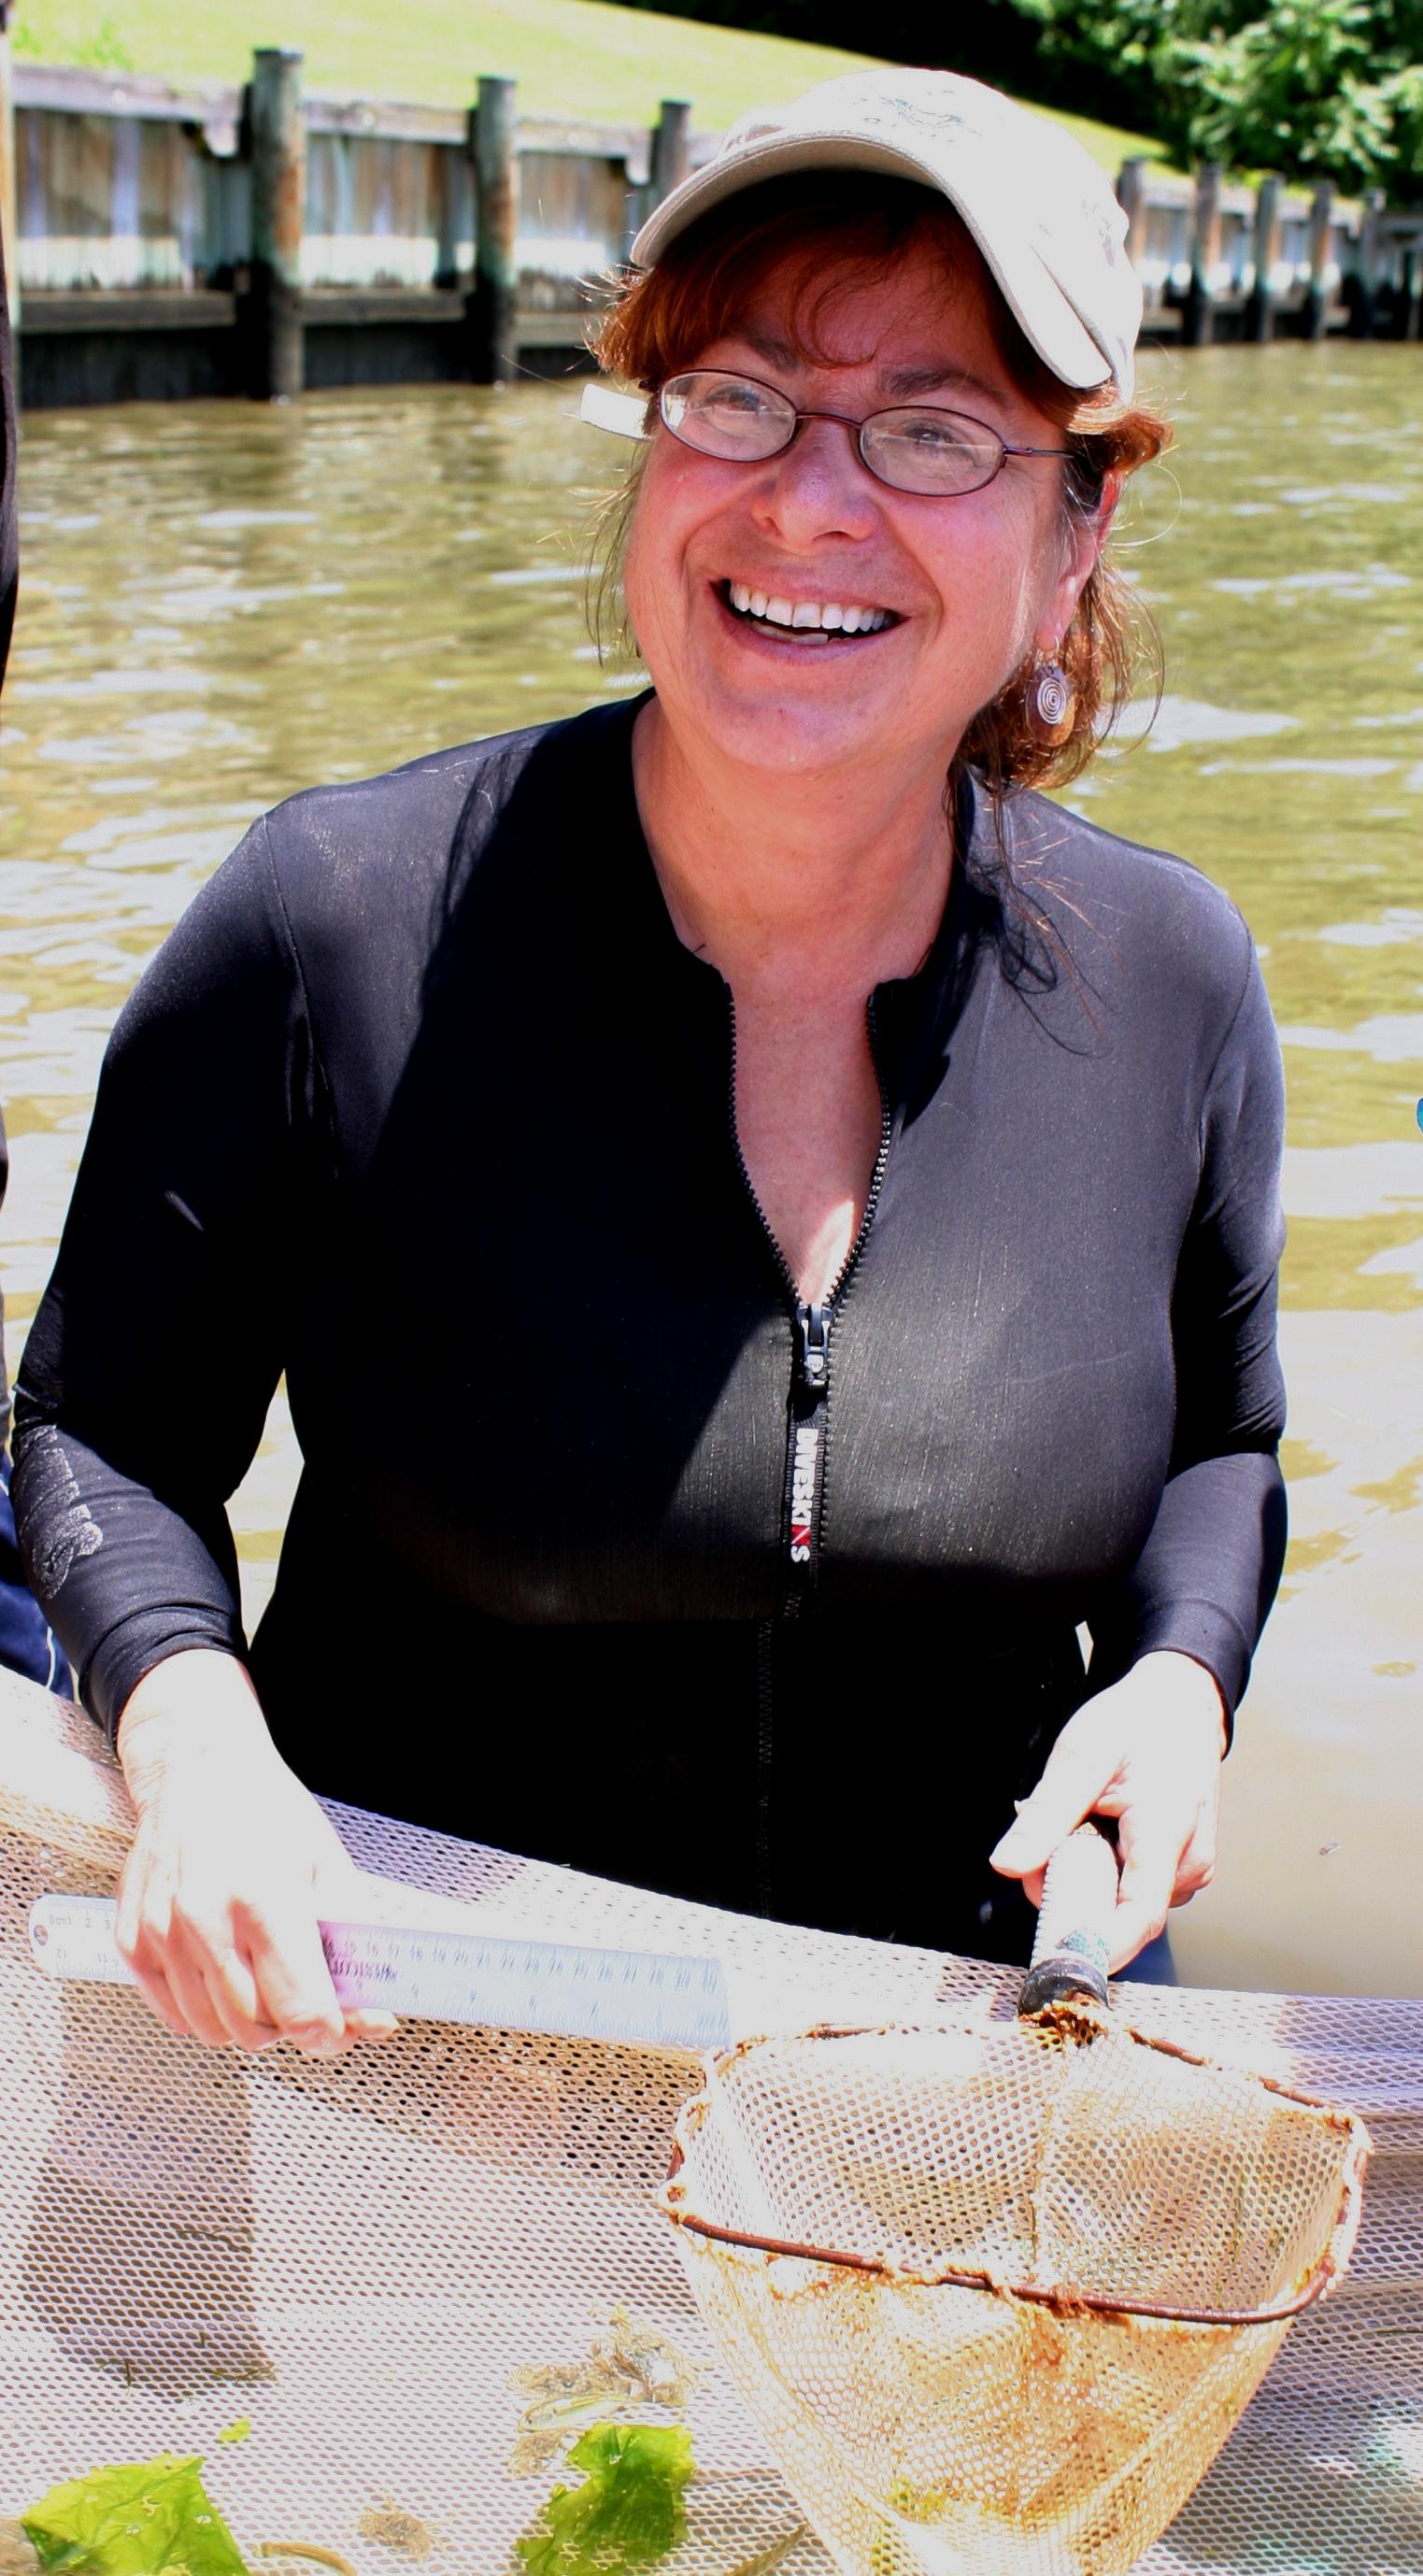 Denise Breitburg samples with net in river.